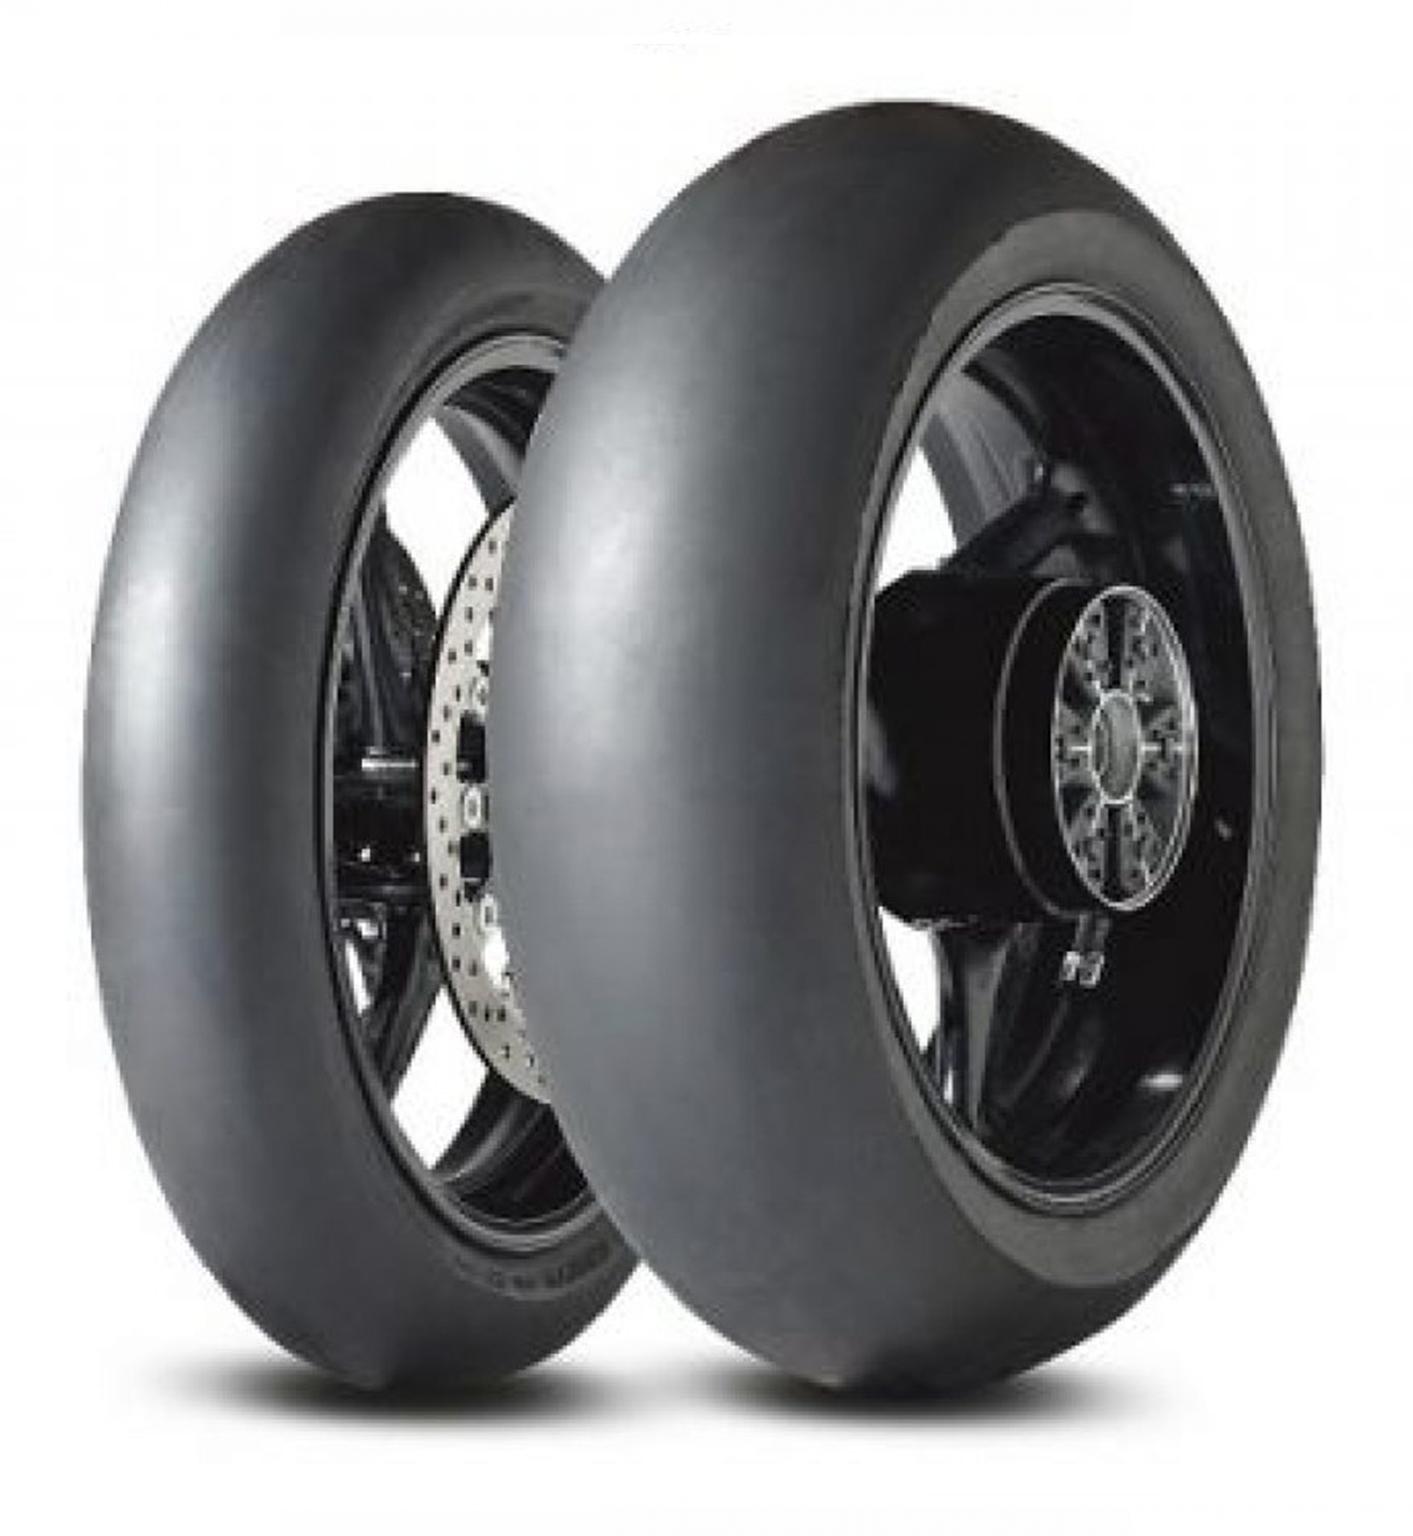 Pneumatico Dunlop KR 195/65 17 ms0-ms2 -ms3-ms4